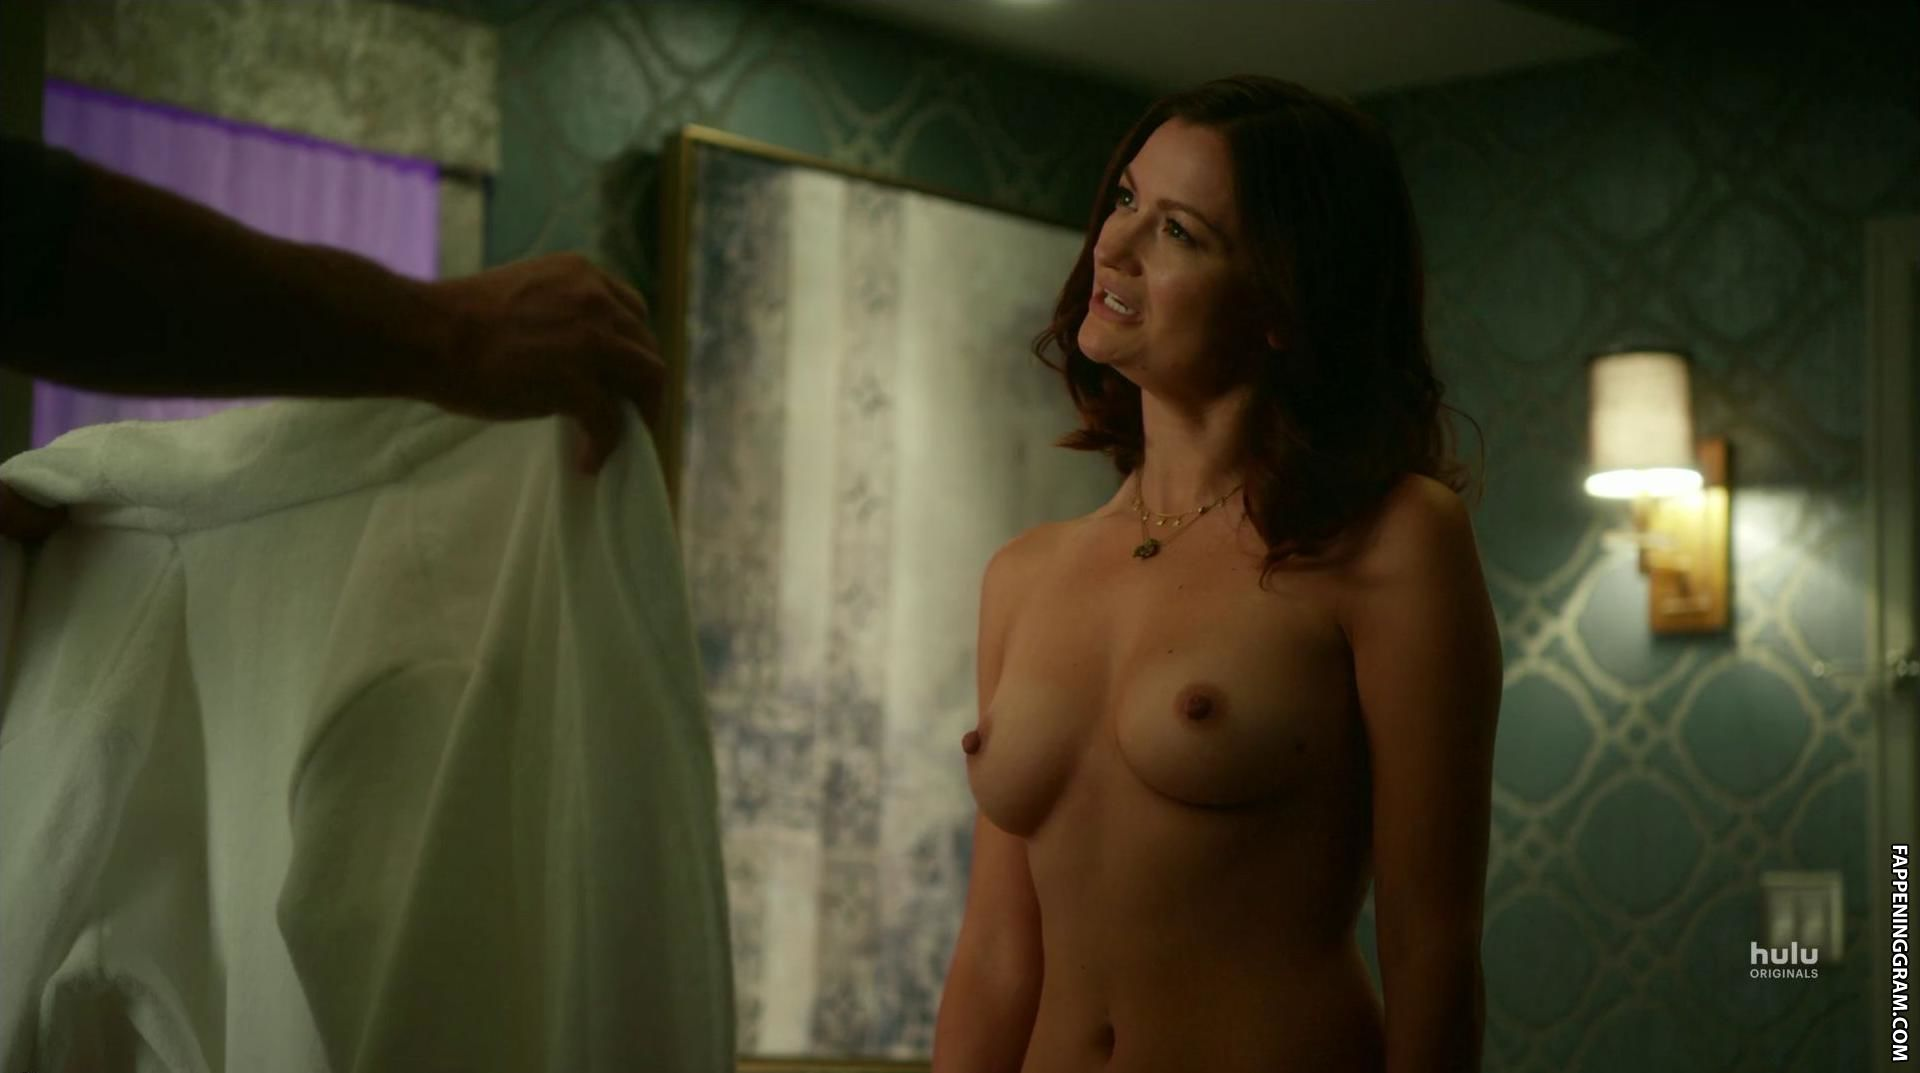 Ayres nude leah Leah Ayres